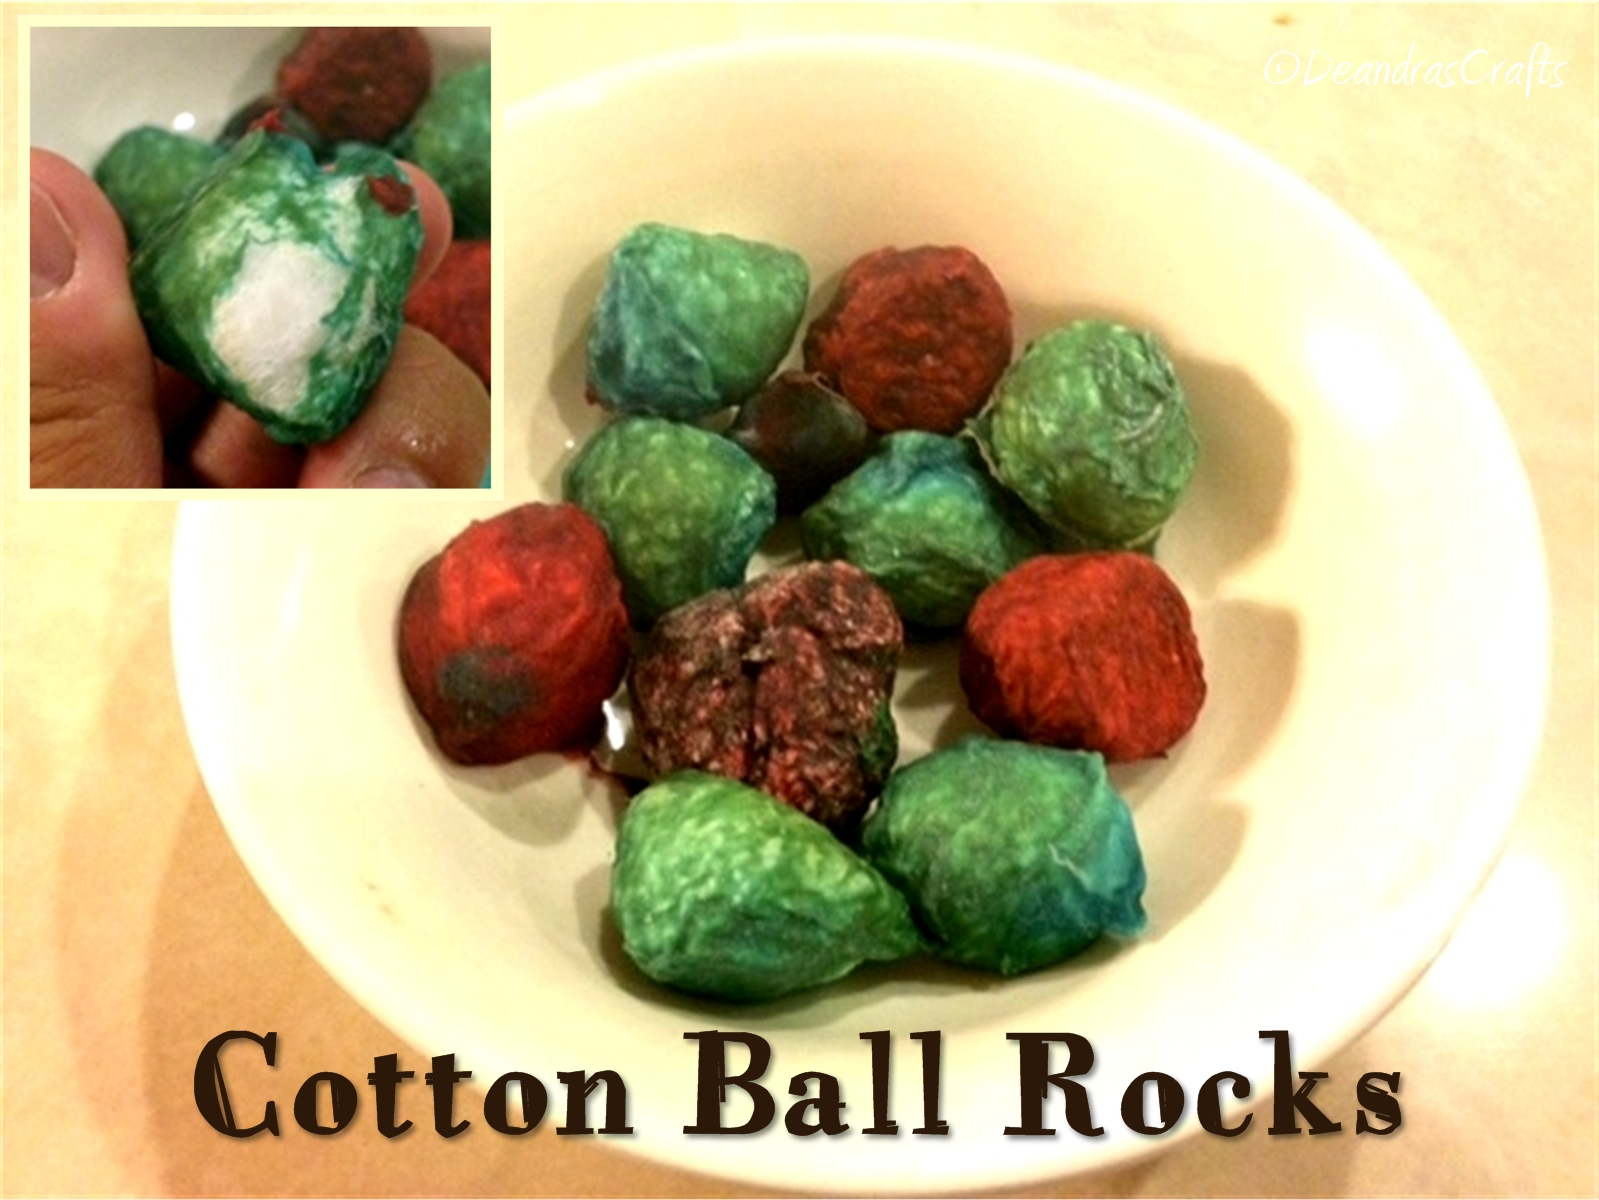 Cotton Ball Rocks